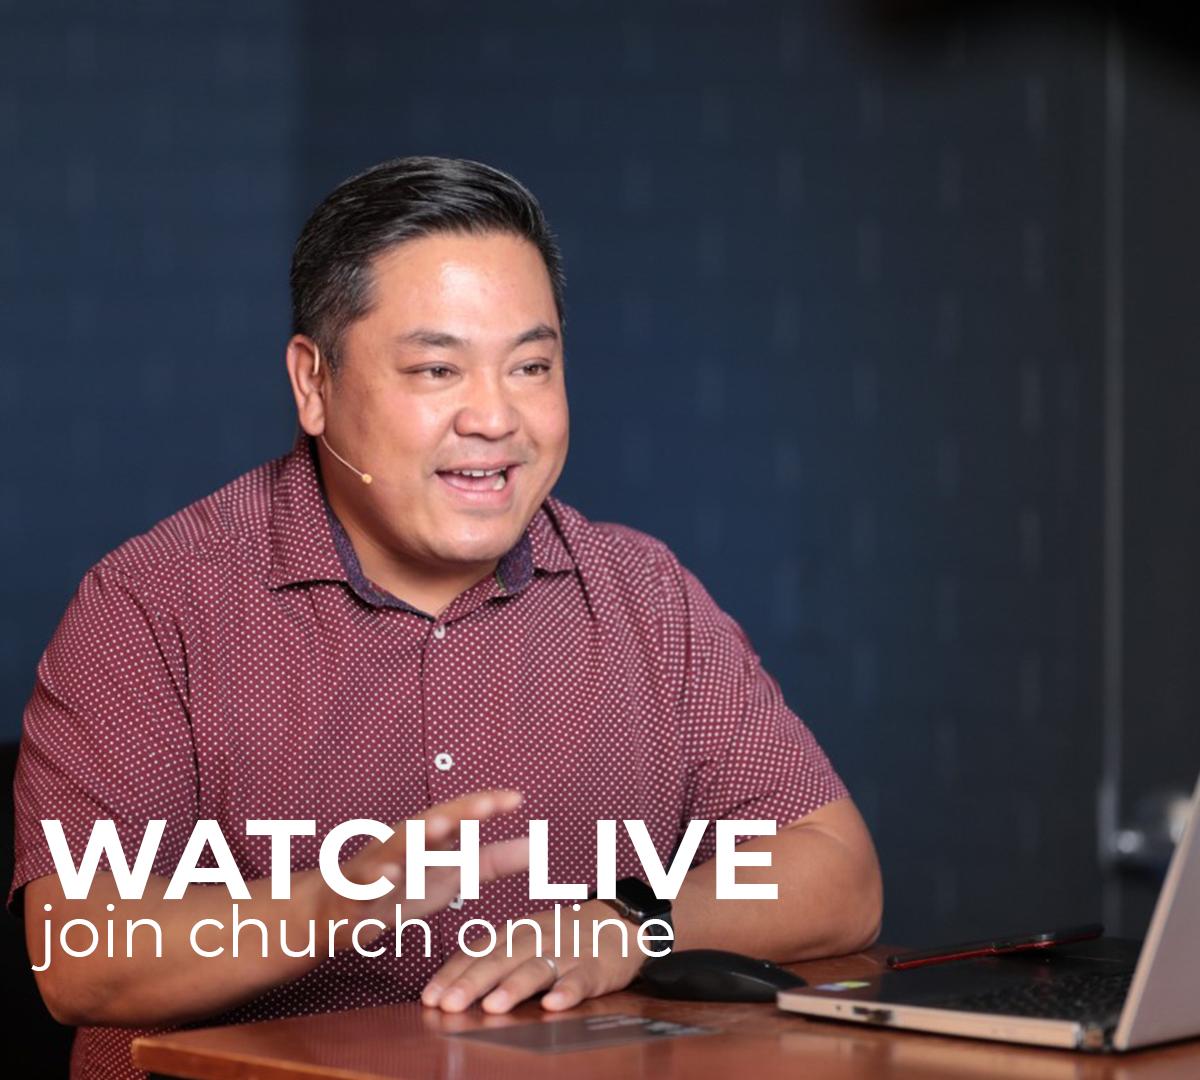 https://cornwall.online.church/